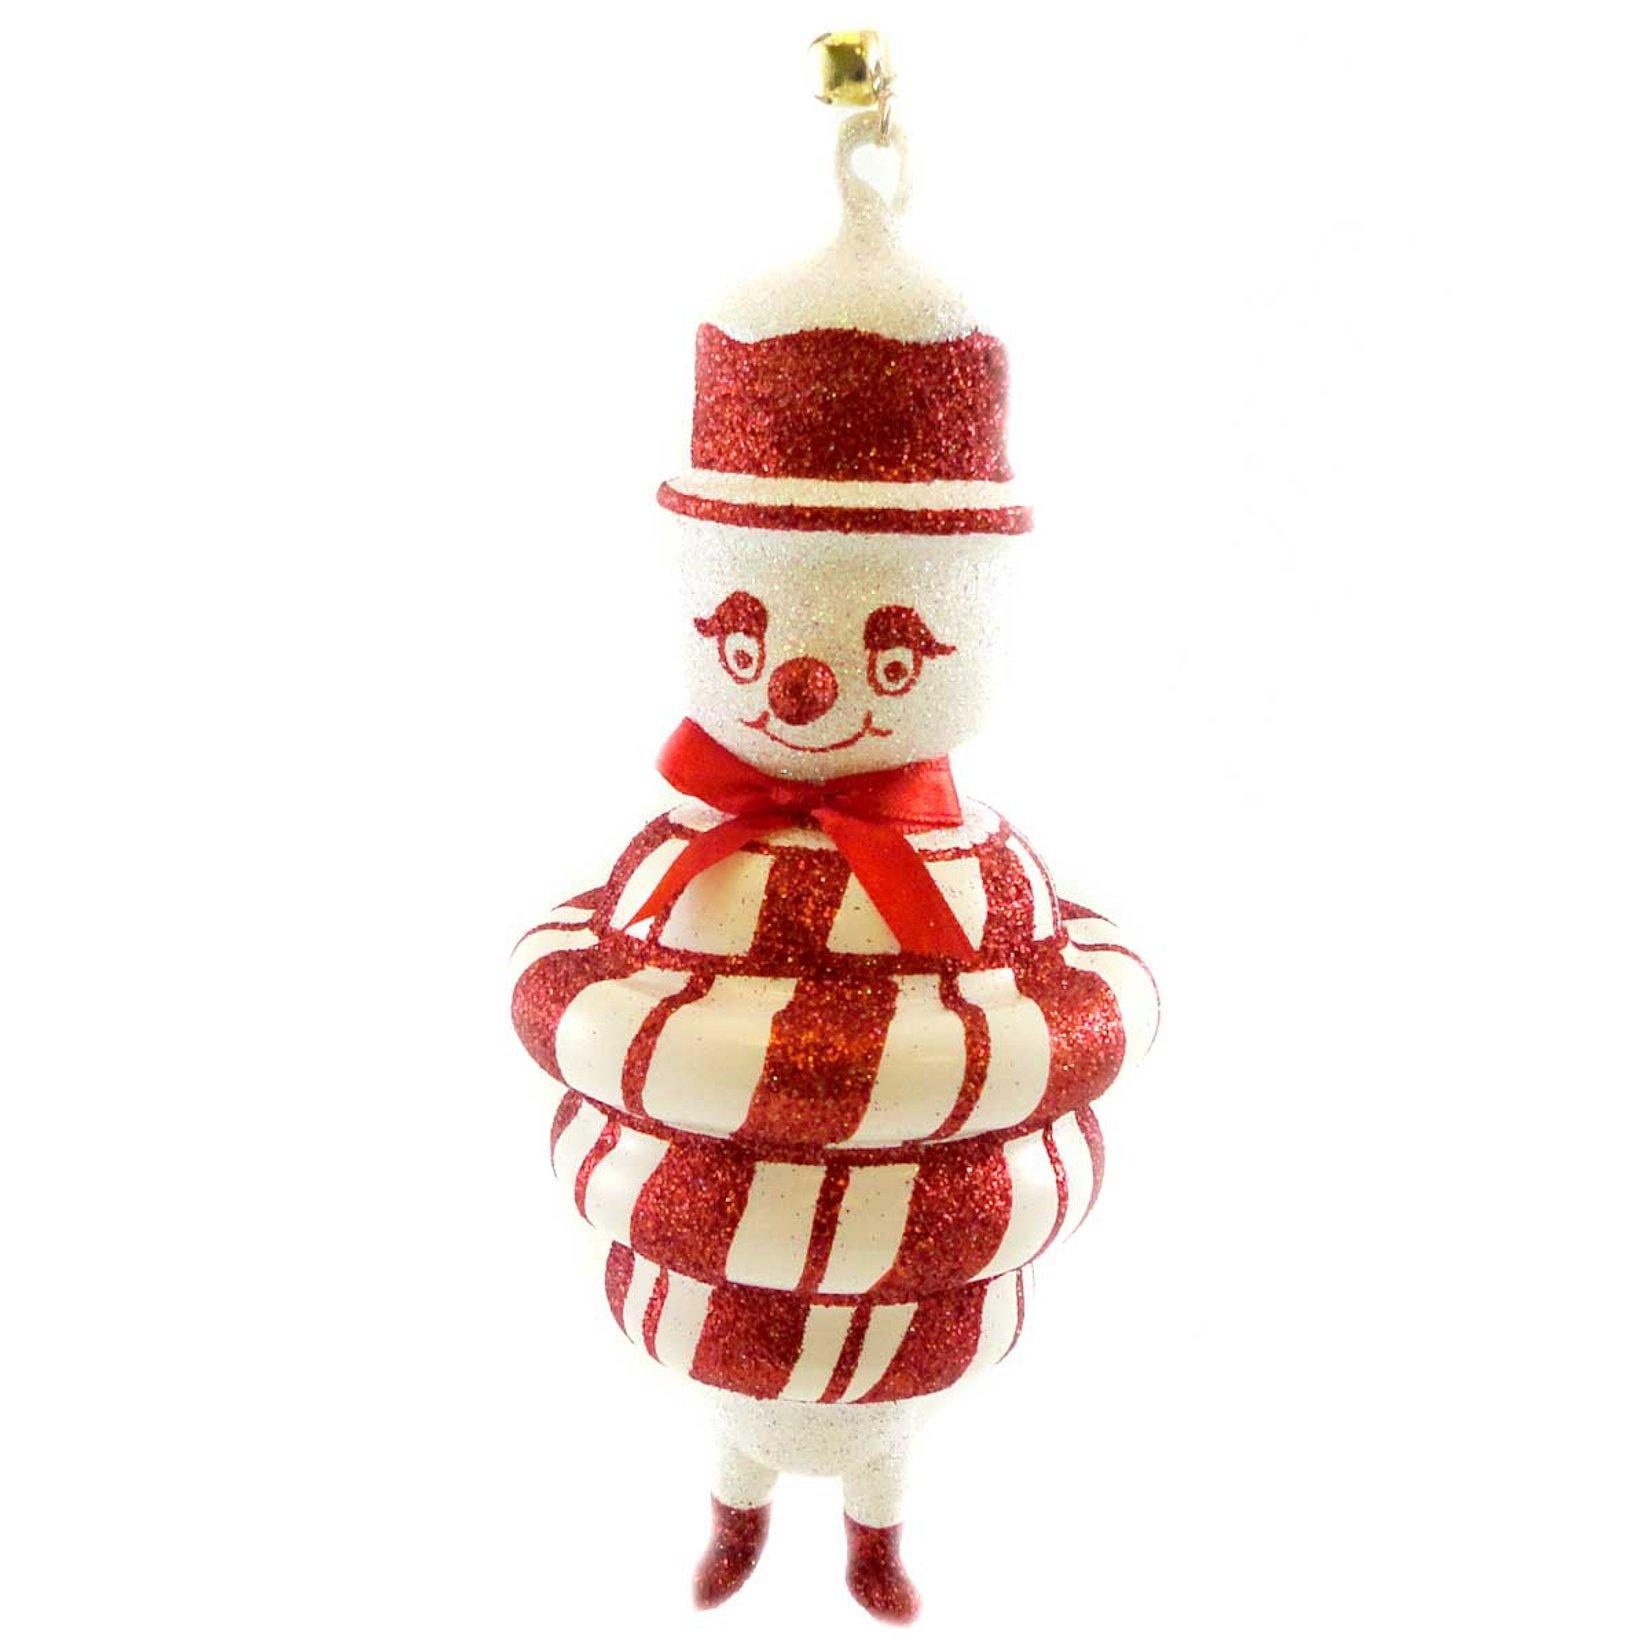 Jinglenog SNO-MINT Blown Glass Ornament Christmas Peppermint 80120